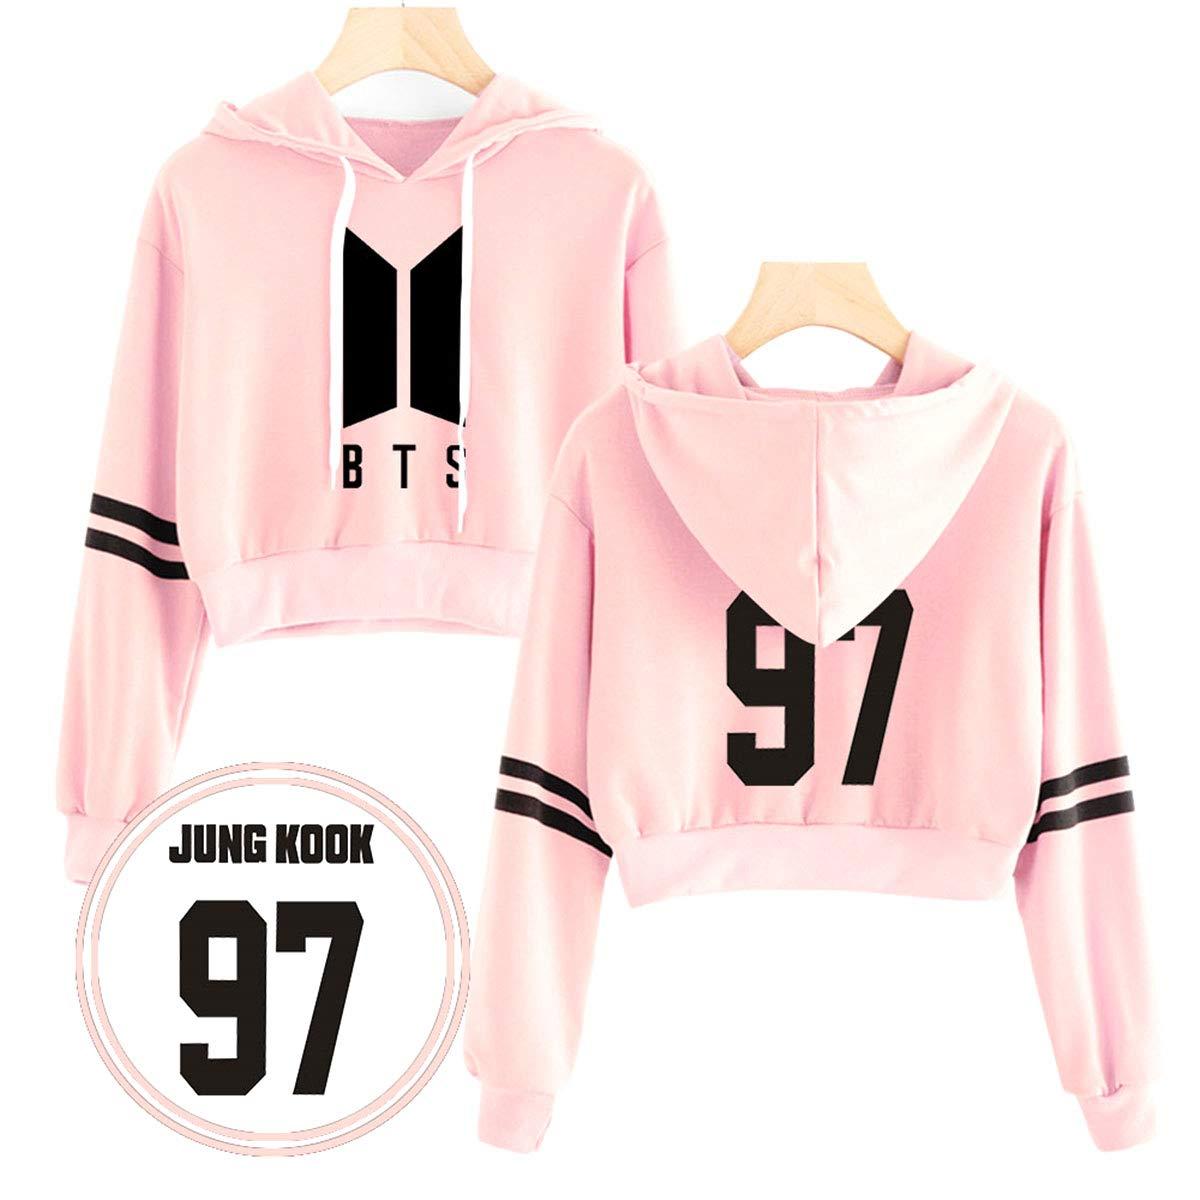 SIMYJOY Kpop Group BTS Sweater Letters Printed Hoodies Crop Top Suga V RM Jimin Jin Jhope Jungkook Sweatshirt Pullover Nice Gifts for Army Girls Women